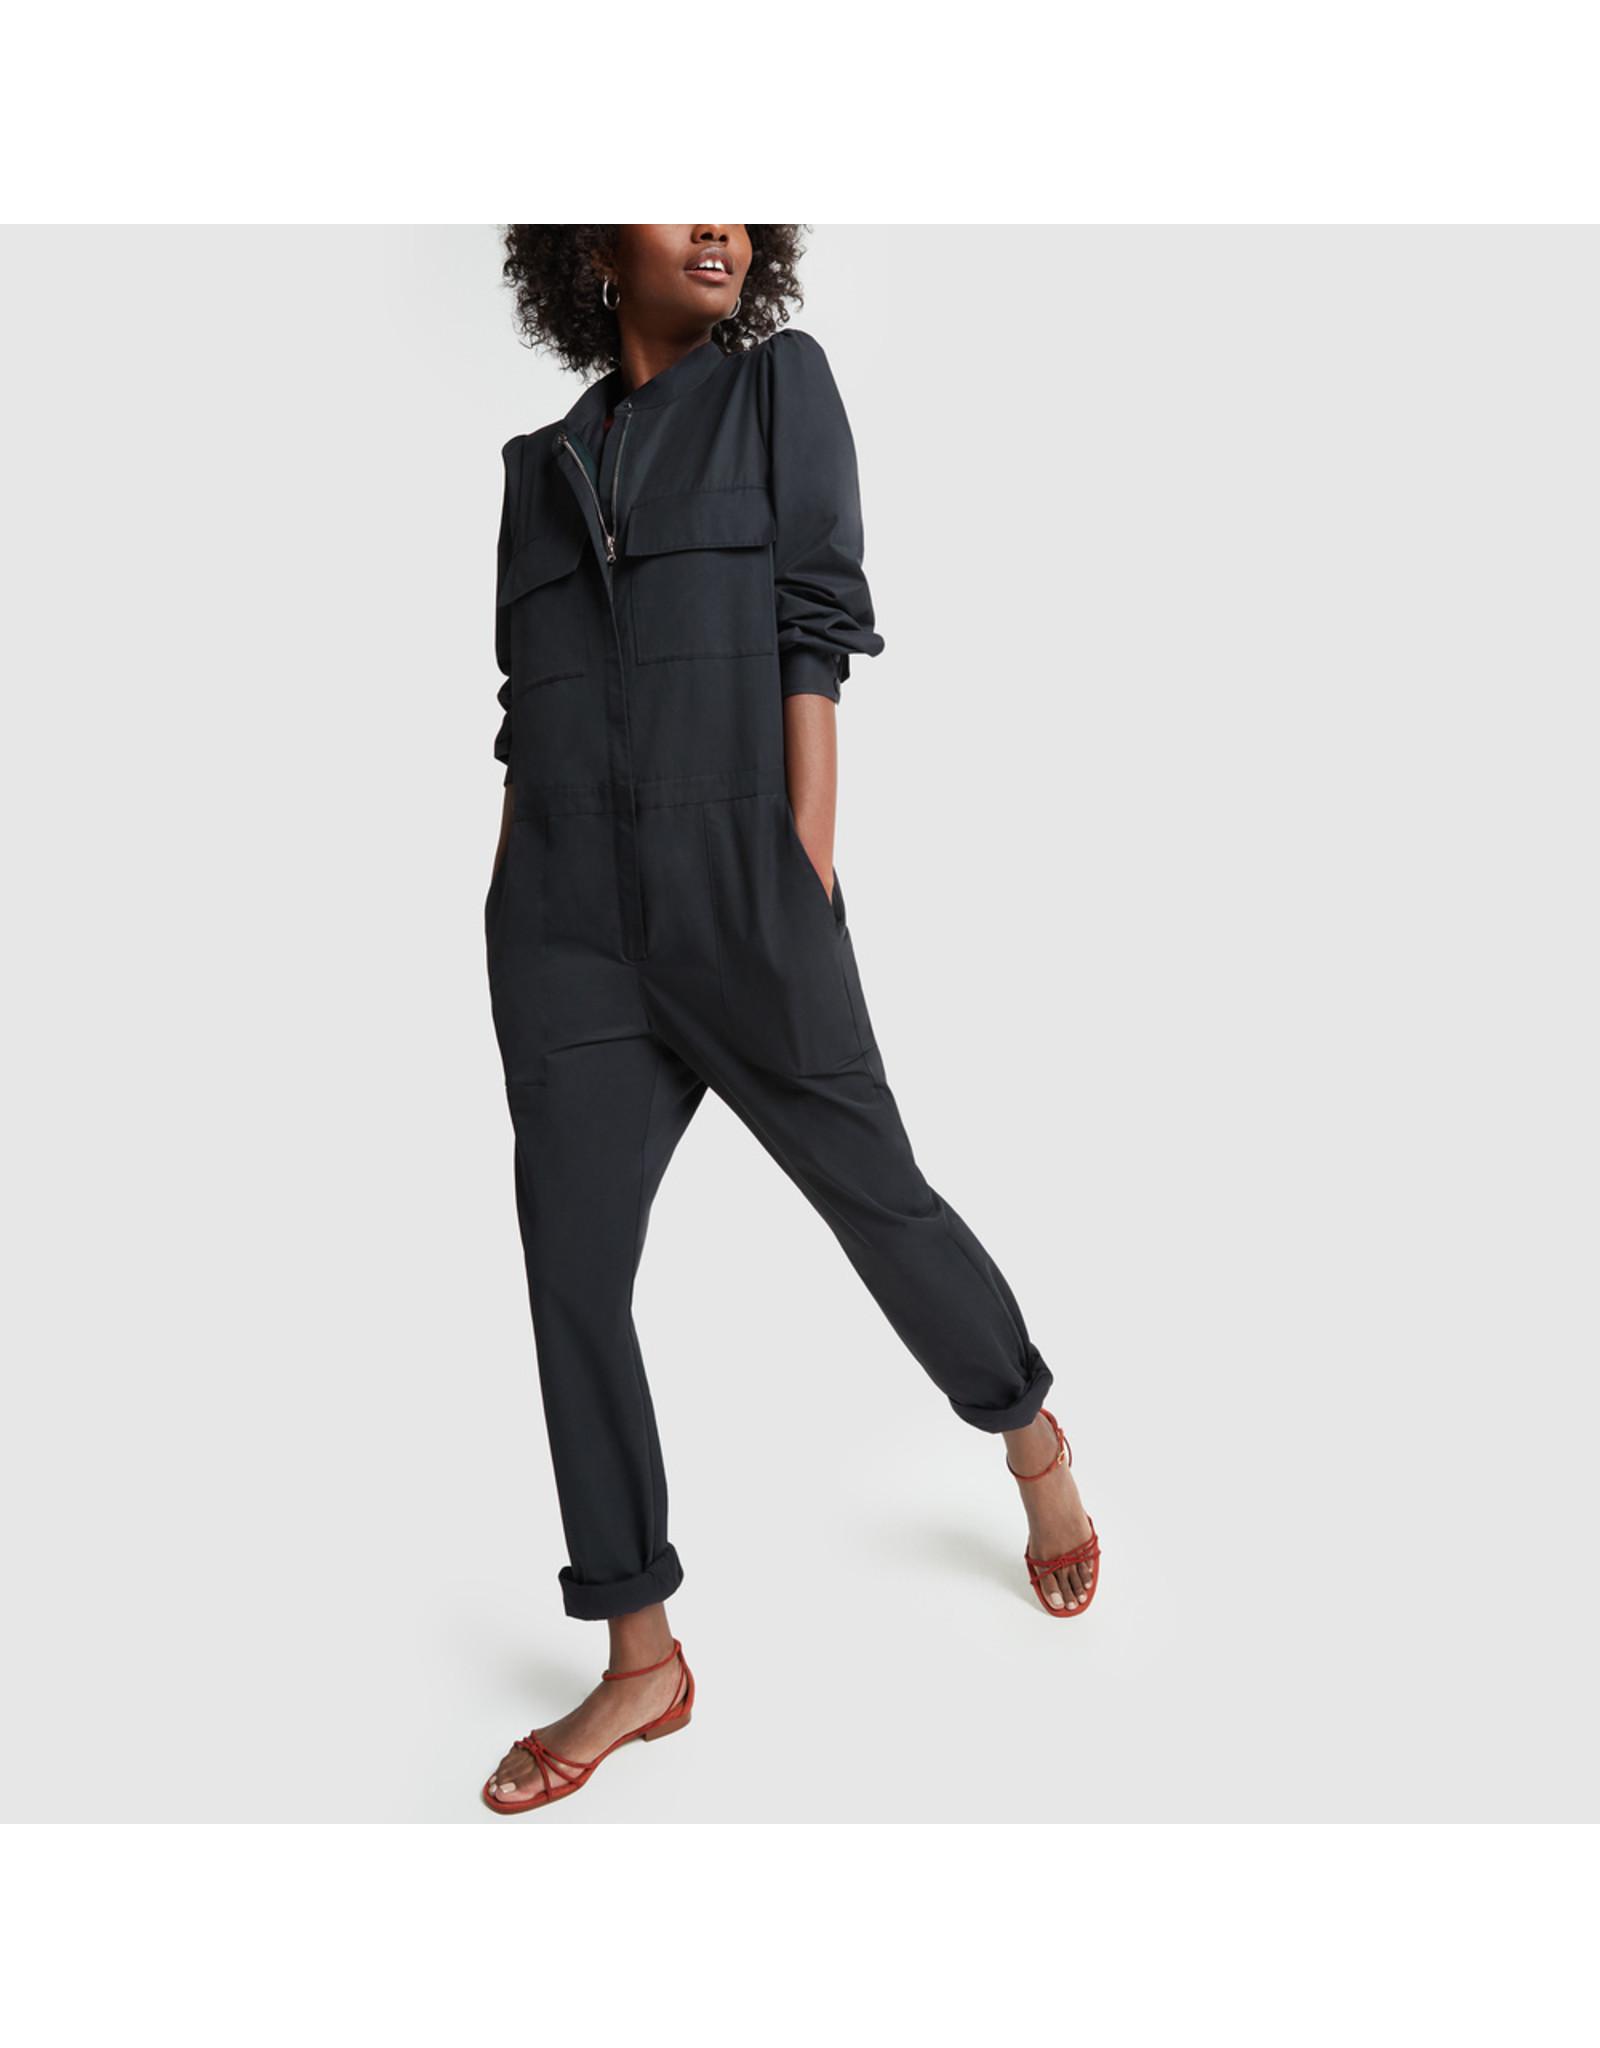 G. Label G. Label Terry Slim Jumpsuit (Size: 6, Color: Navy)